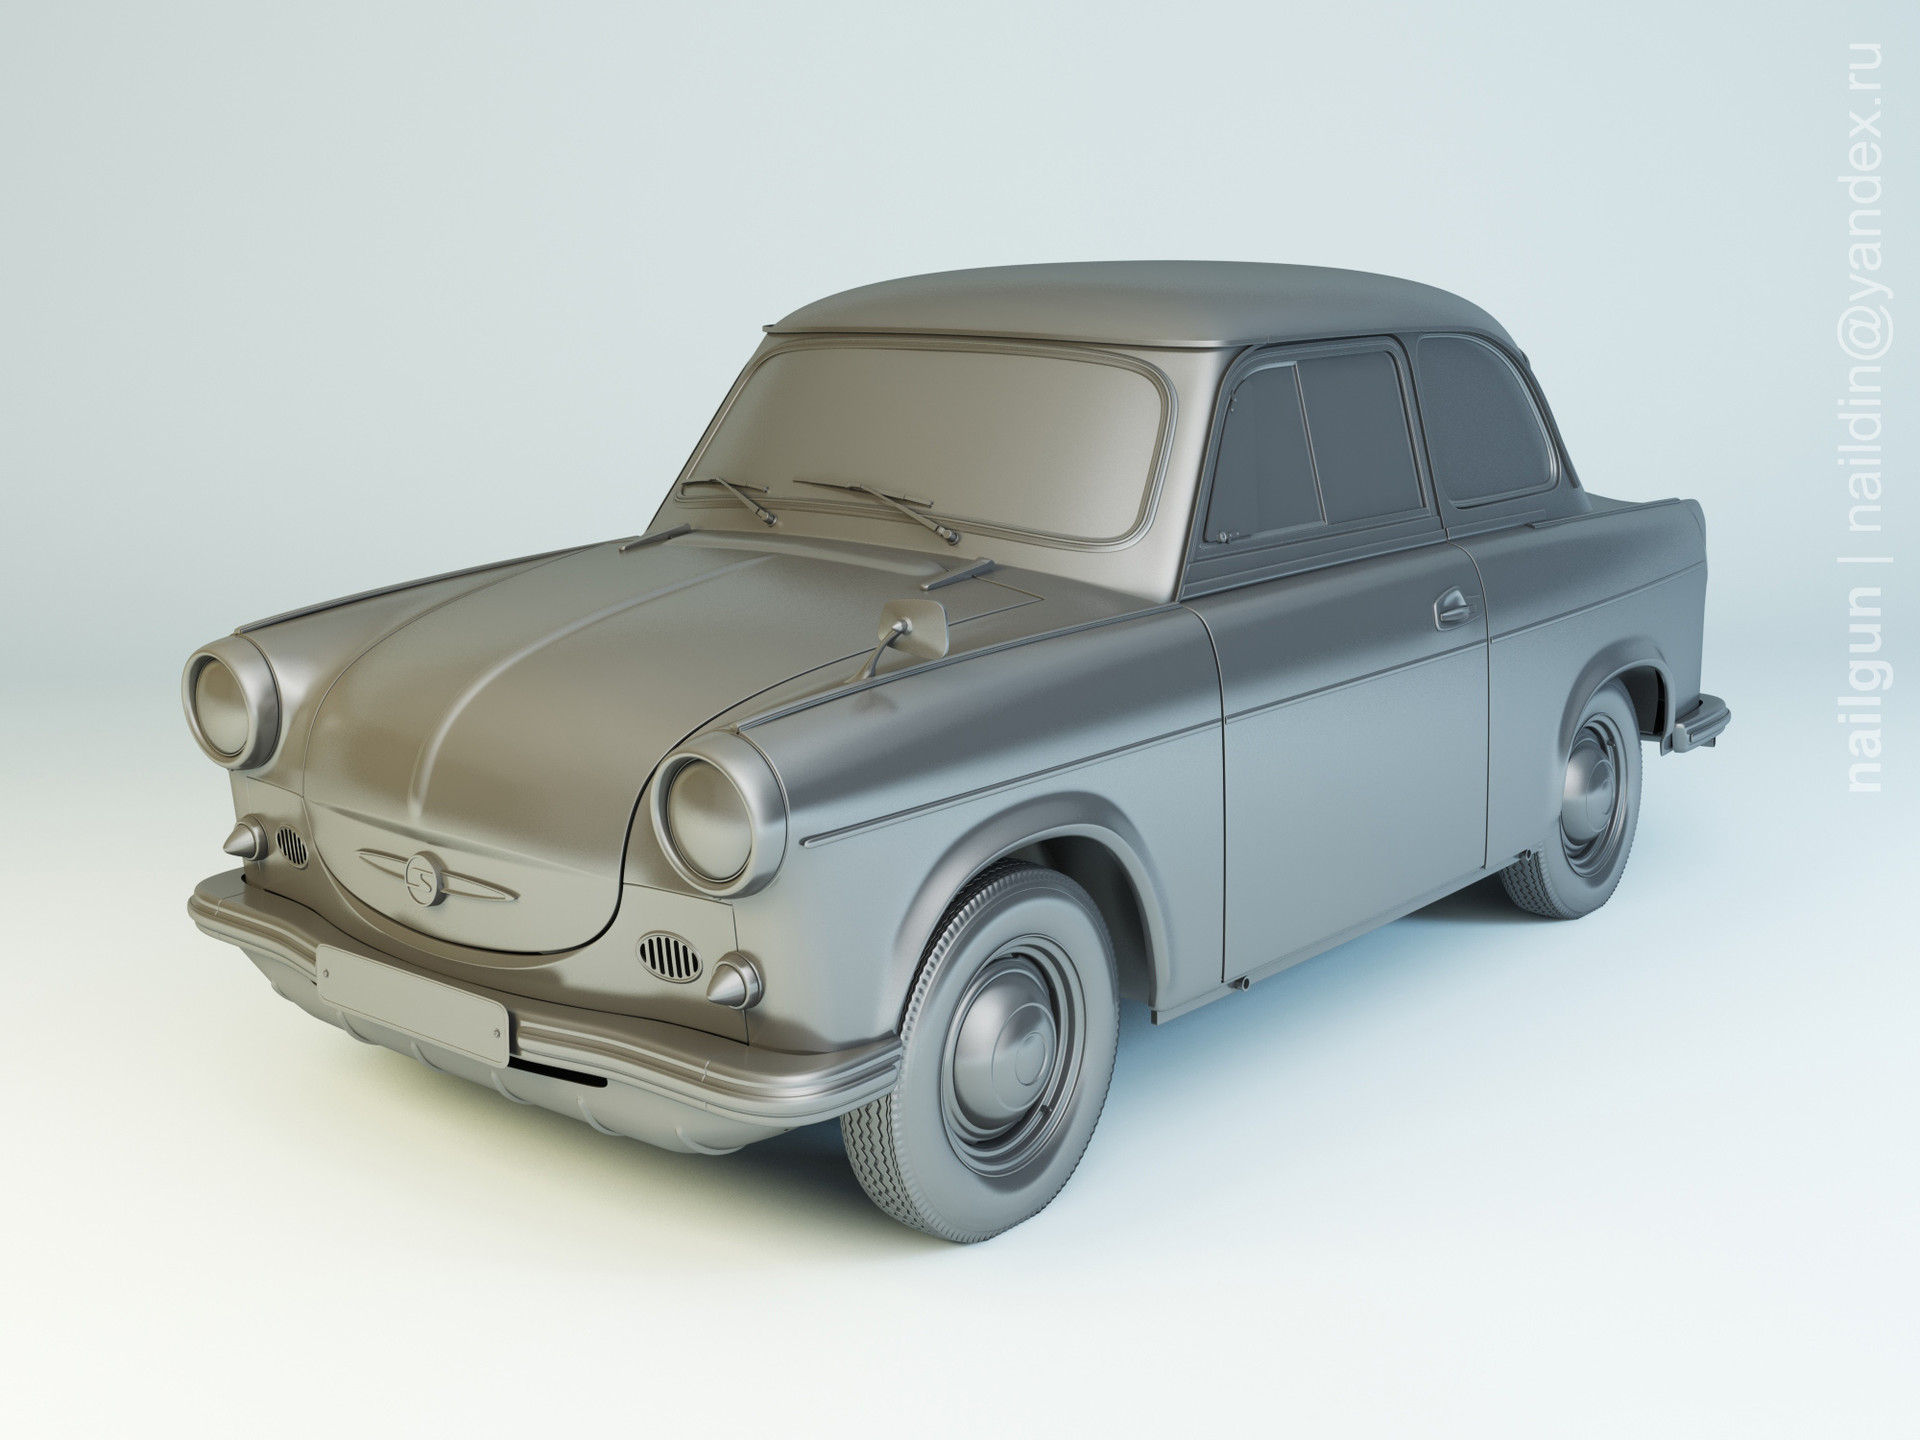 Nail khusnutdinov als 173 003 trabant p50 modelling 0